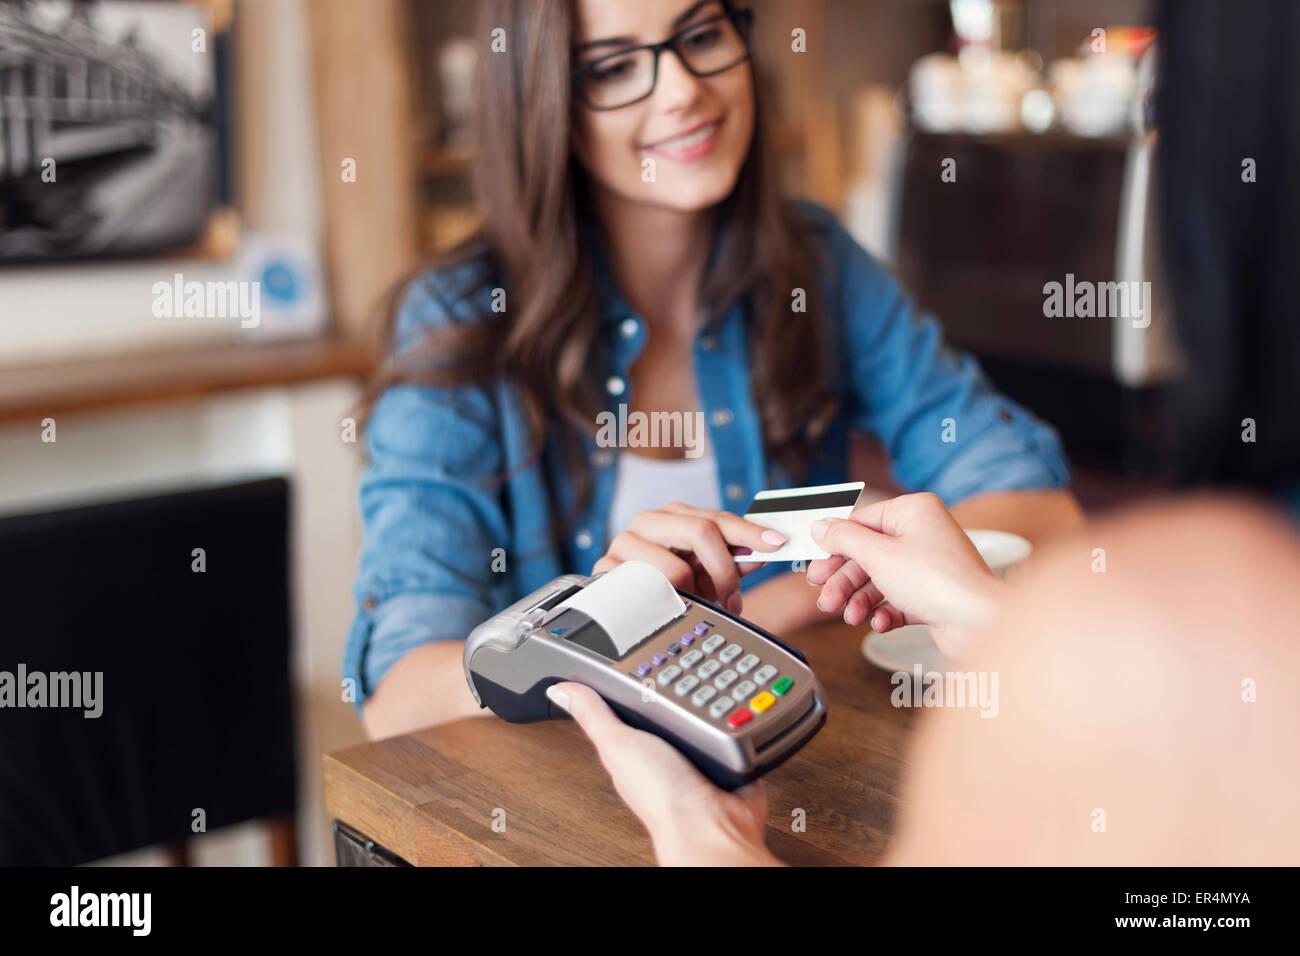 Lächelnde Frau Kaffee per Kreditkarte bezahlen. Krakau, Polen Stockbild